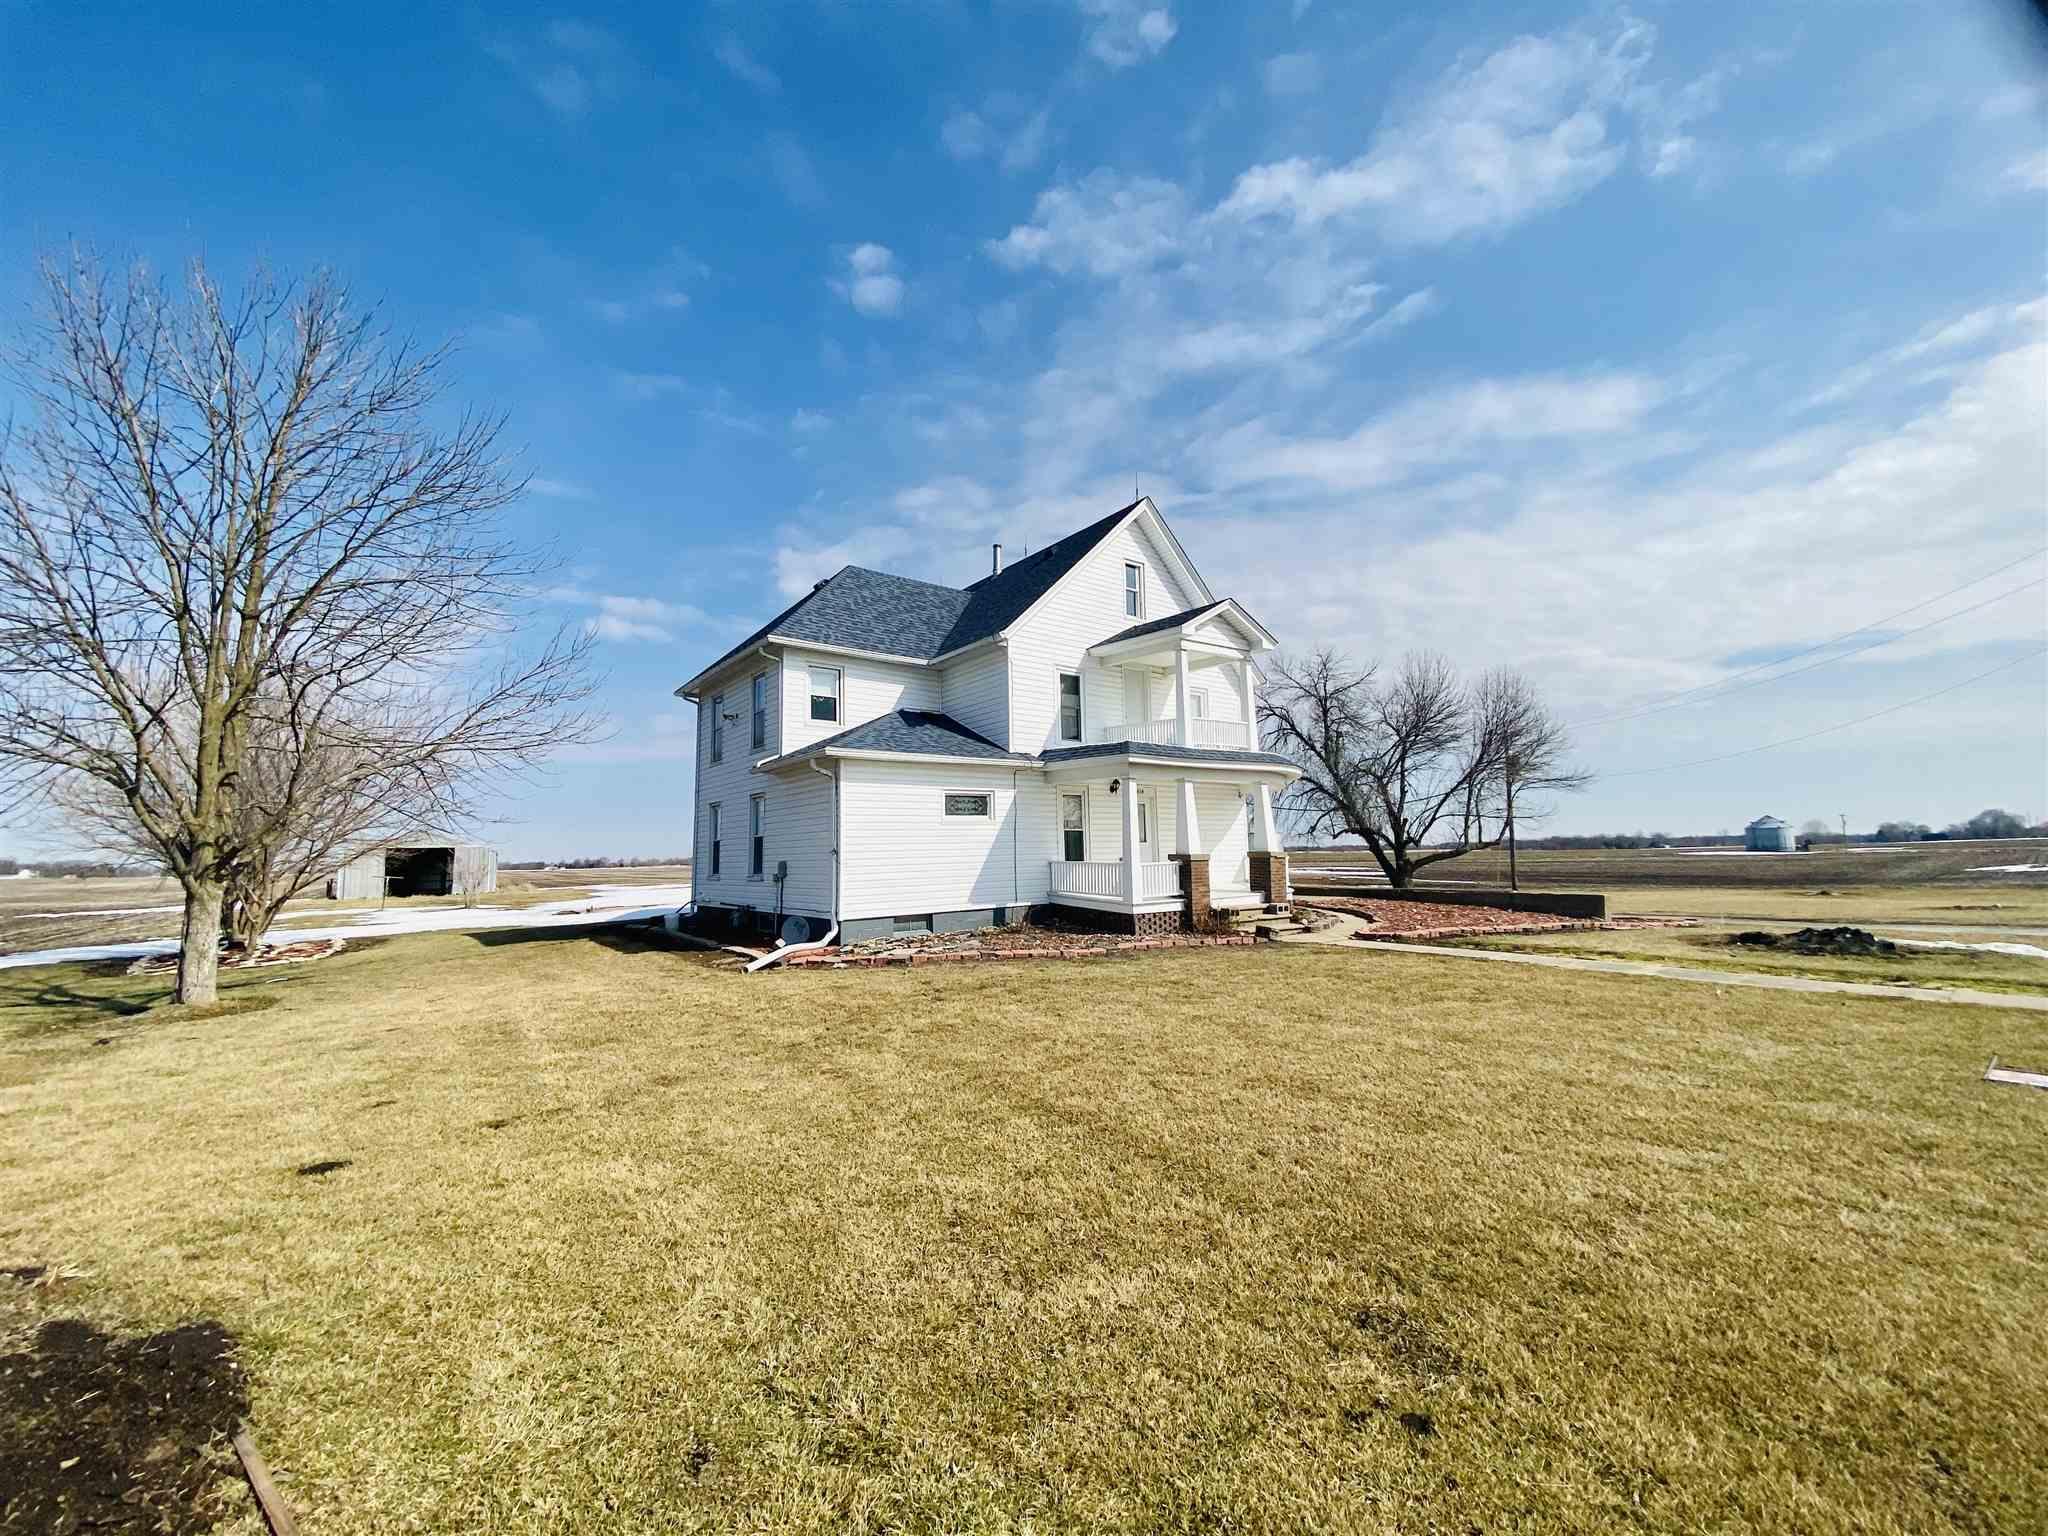 2434 95TH Property Photo - Viola, IL real estate listing